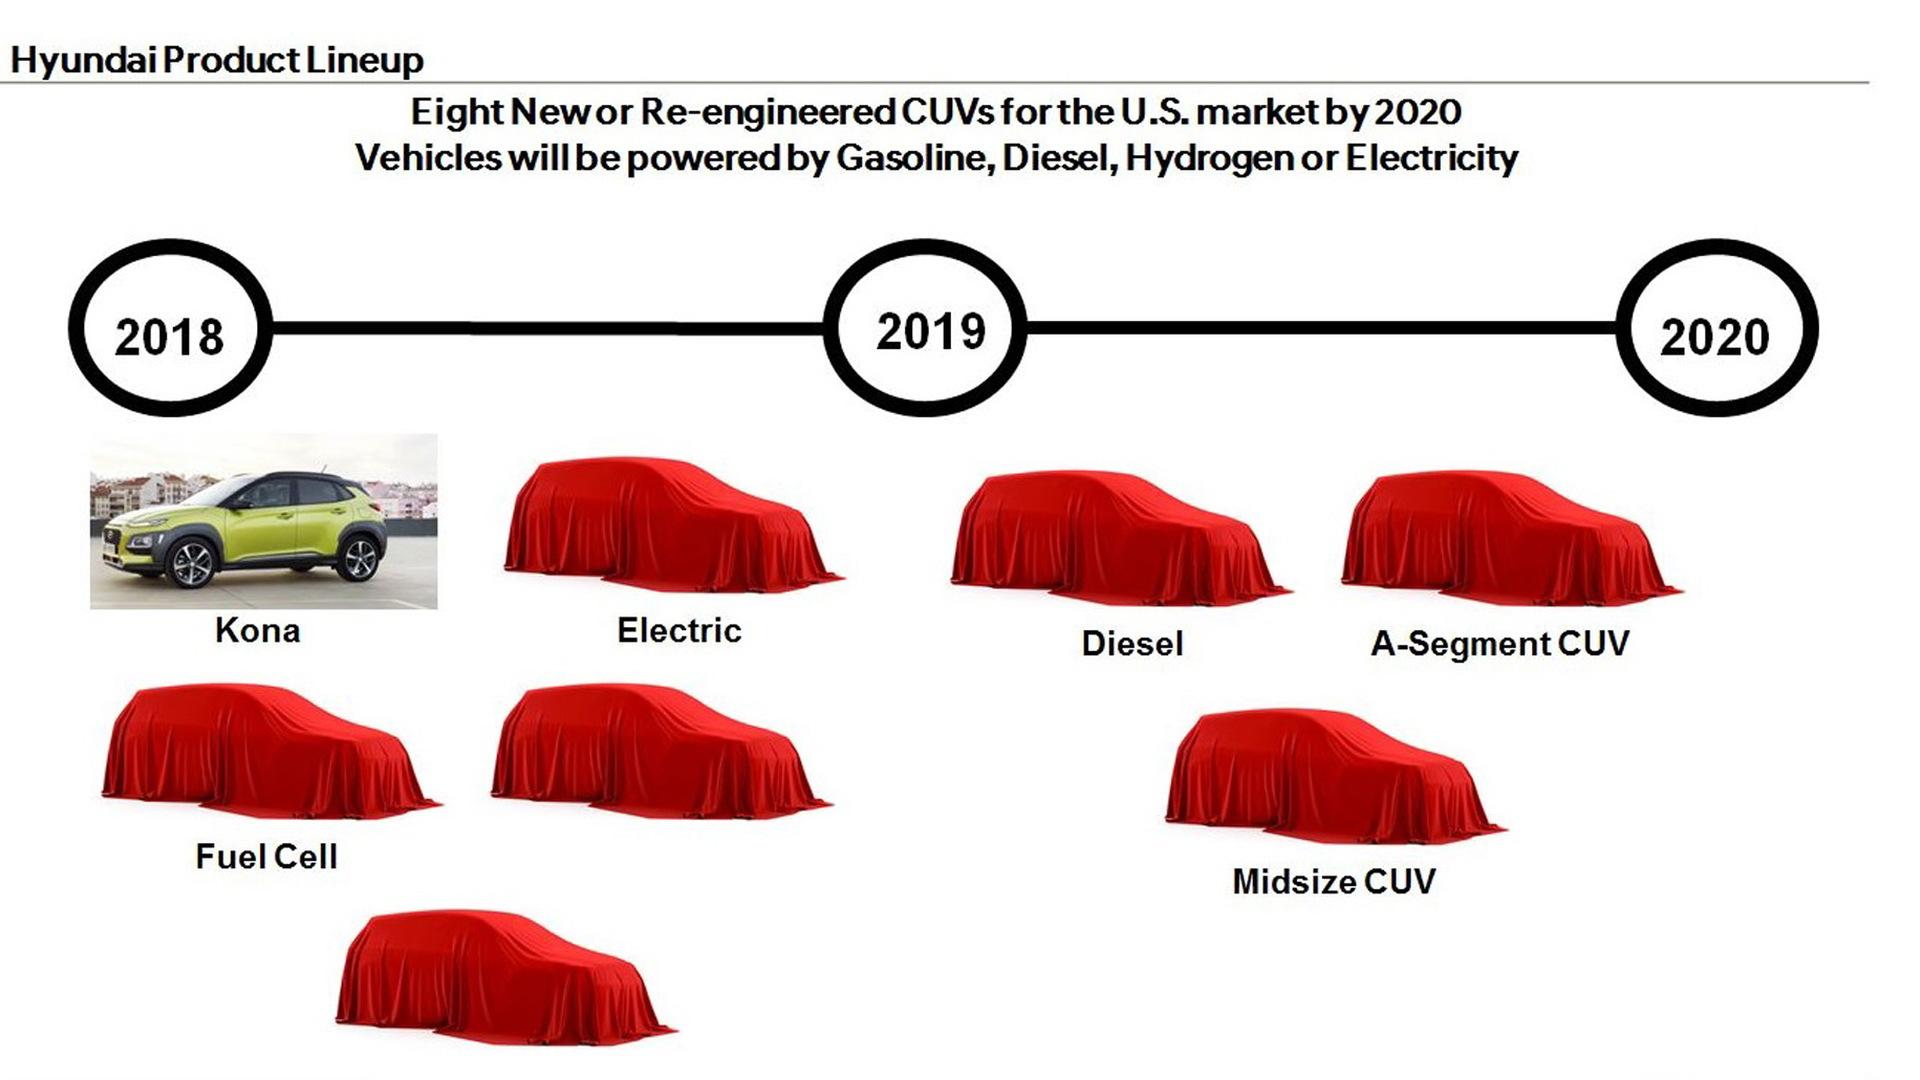 Hyundai SUV roadmap